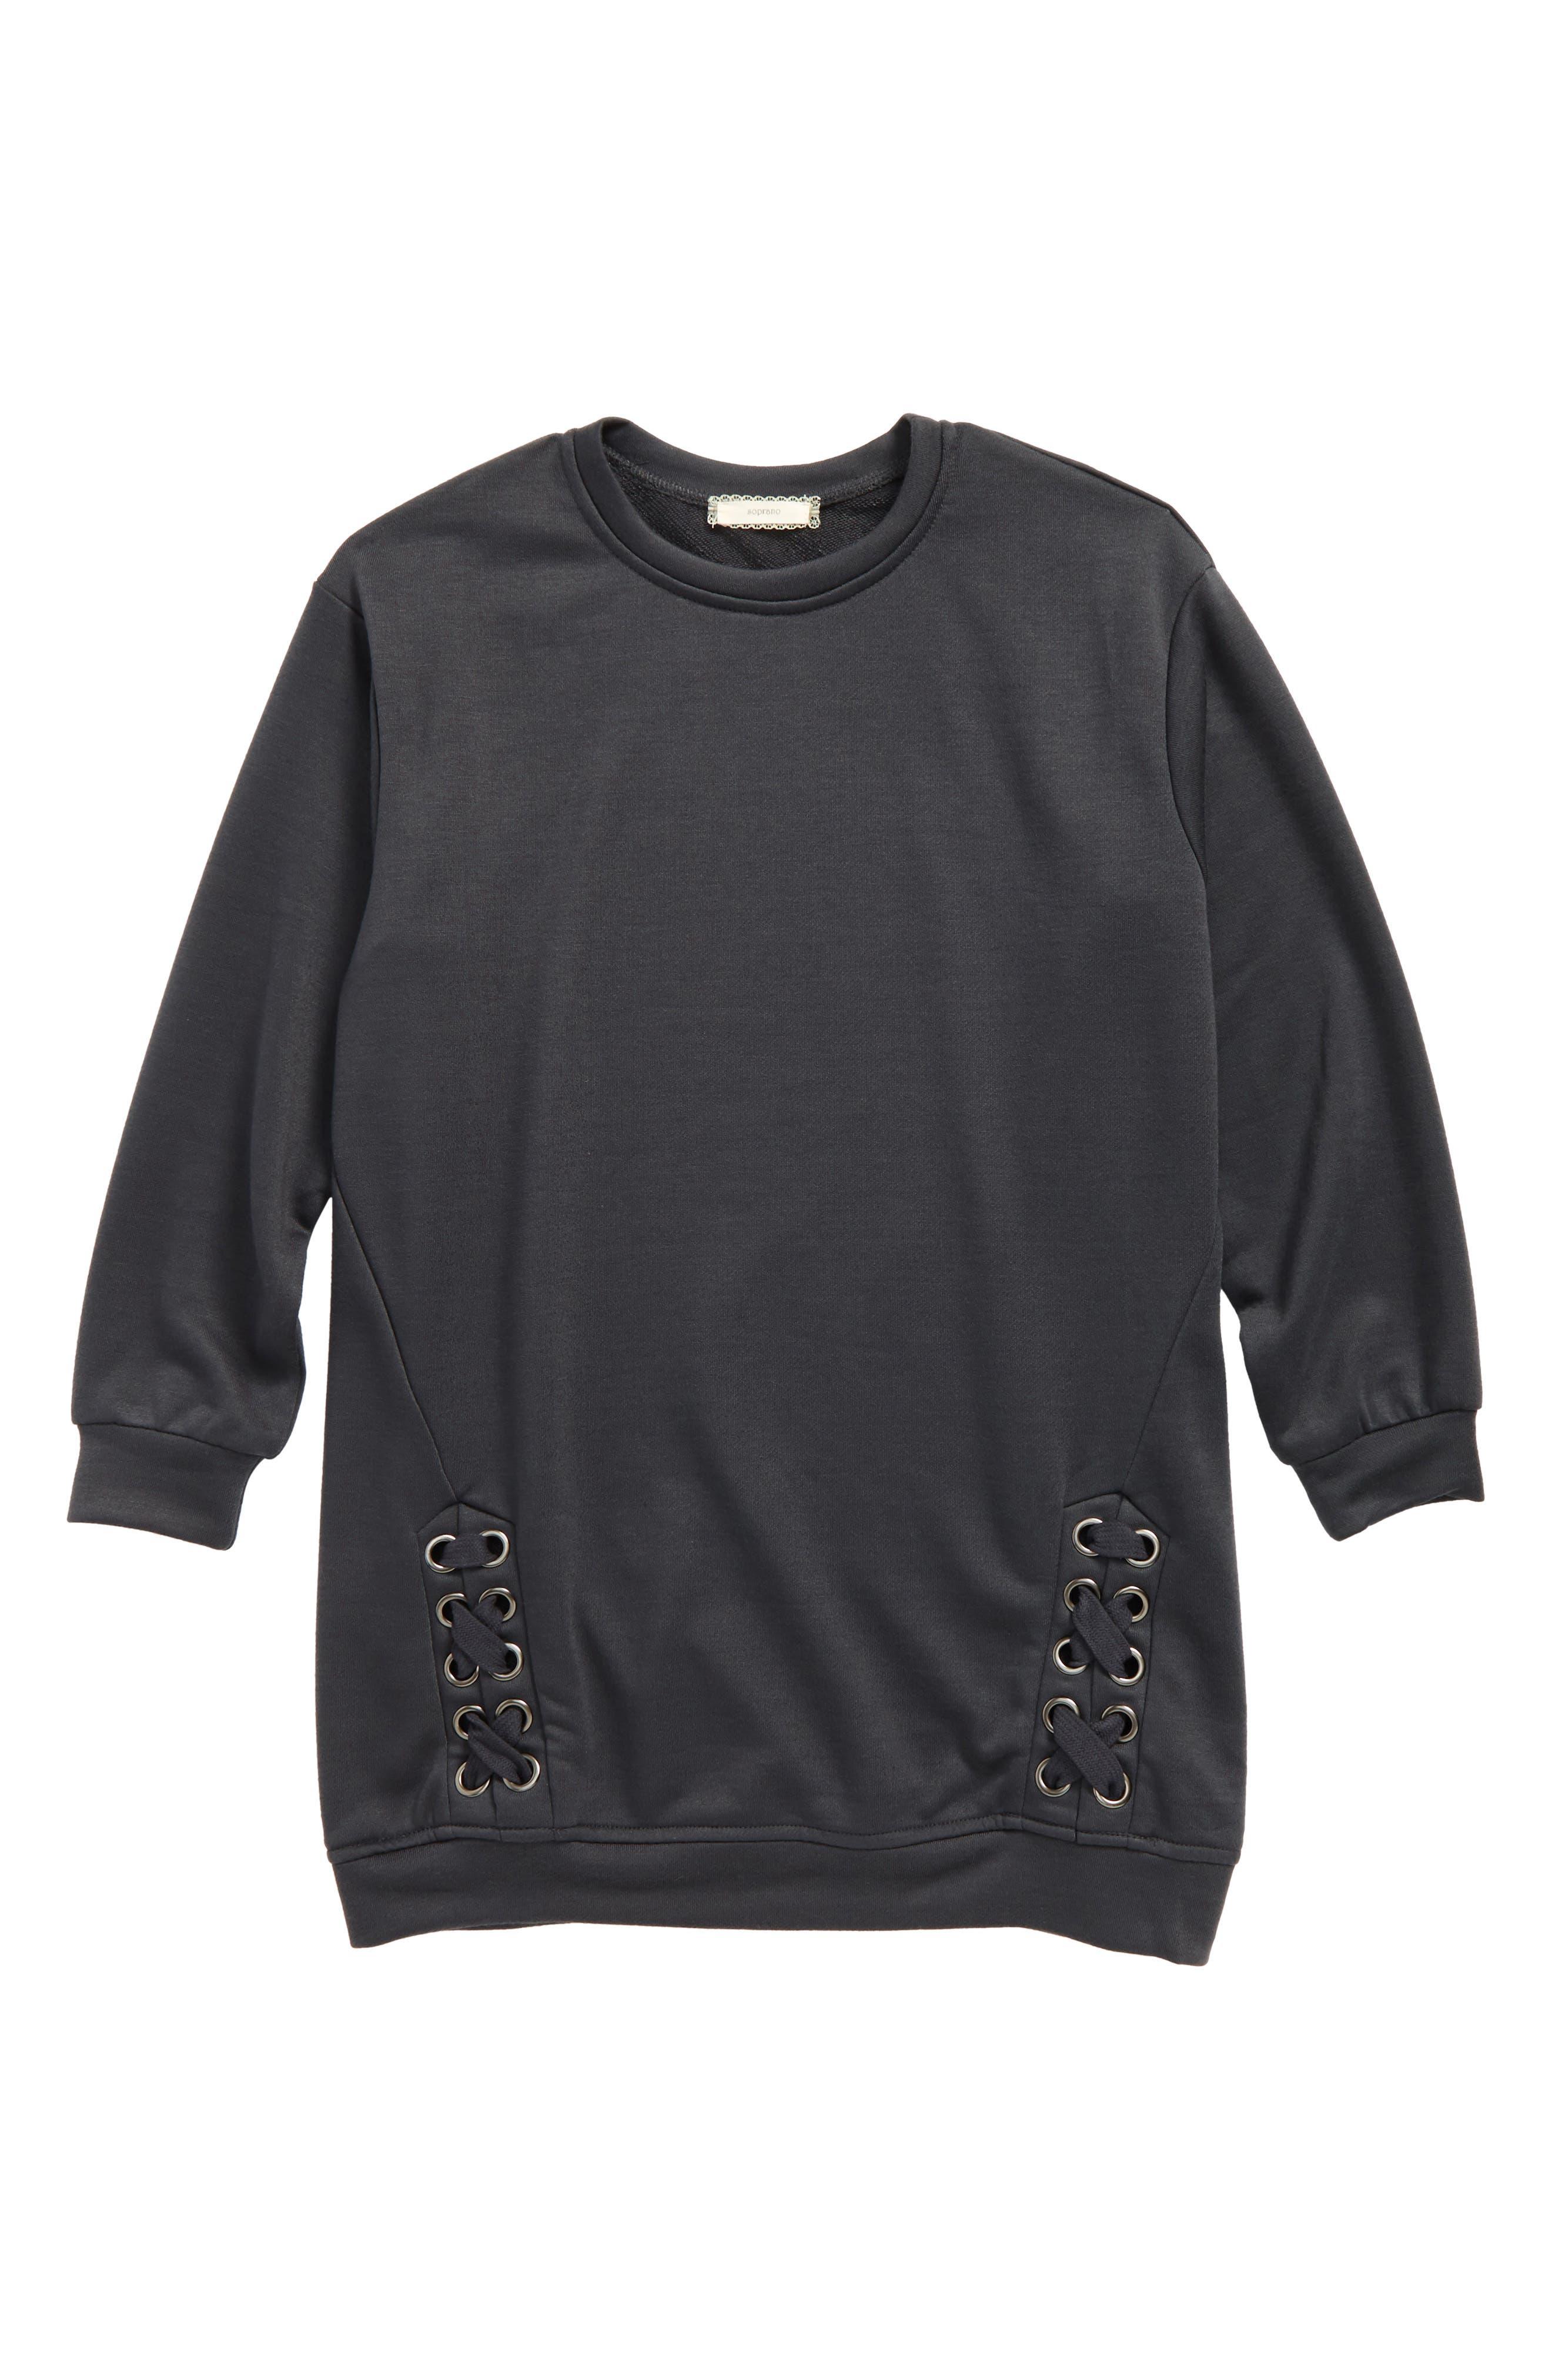 Alternate Image 1 Selected - Soprano Side Lace Sweatshirt (Big Girls)